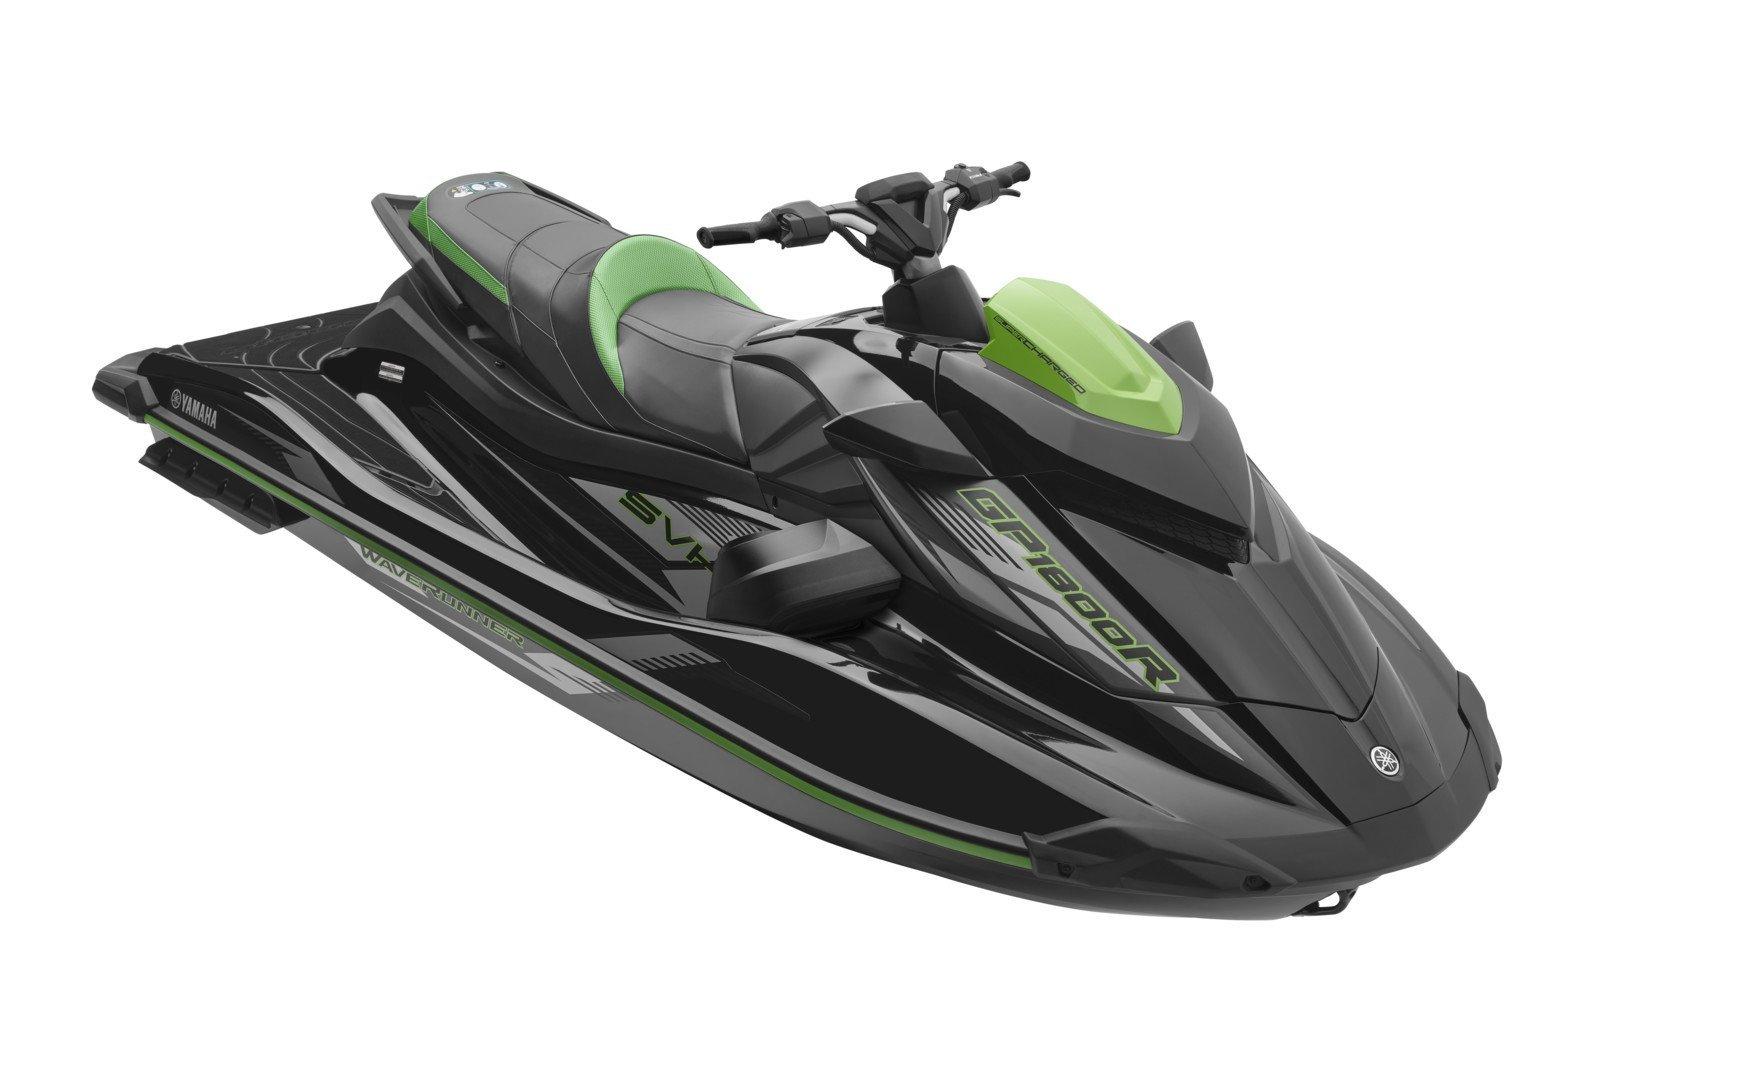 Yamaha-Waverunner-GP1800R SVHO 2021-Large